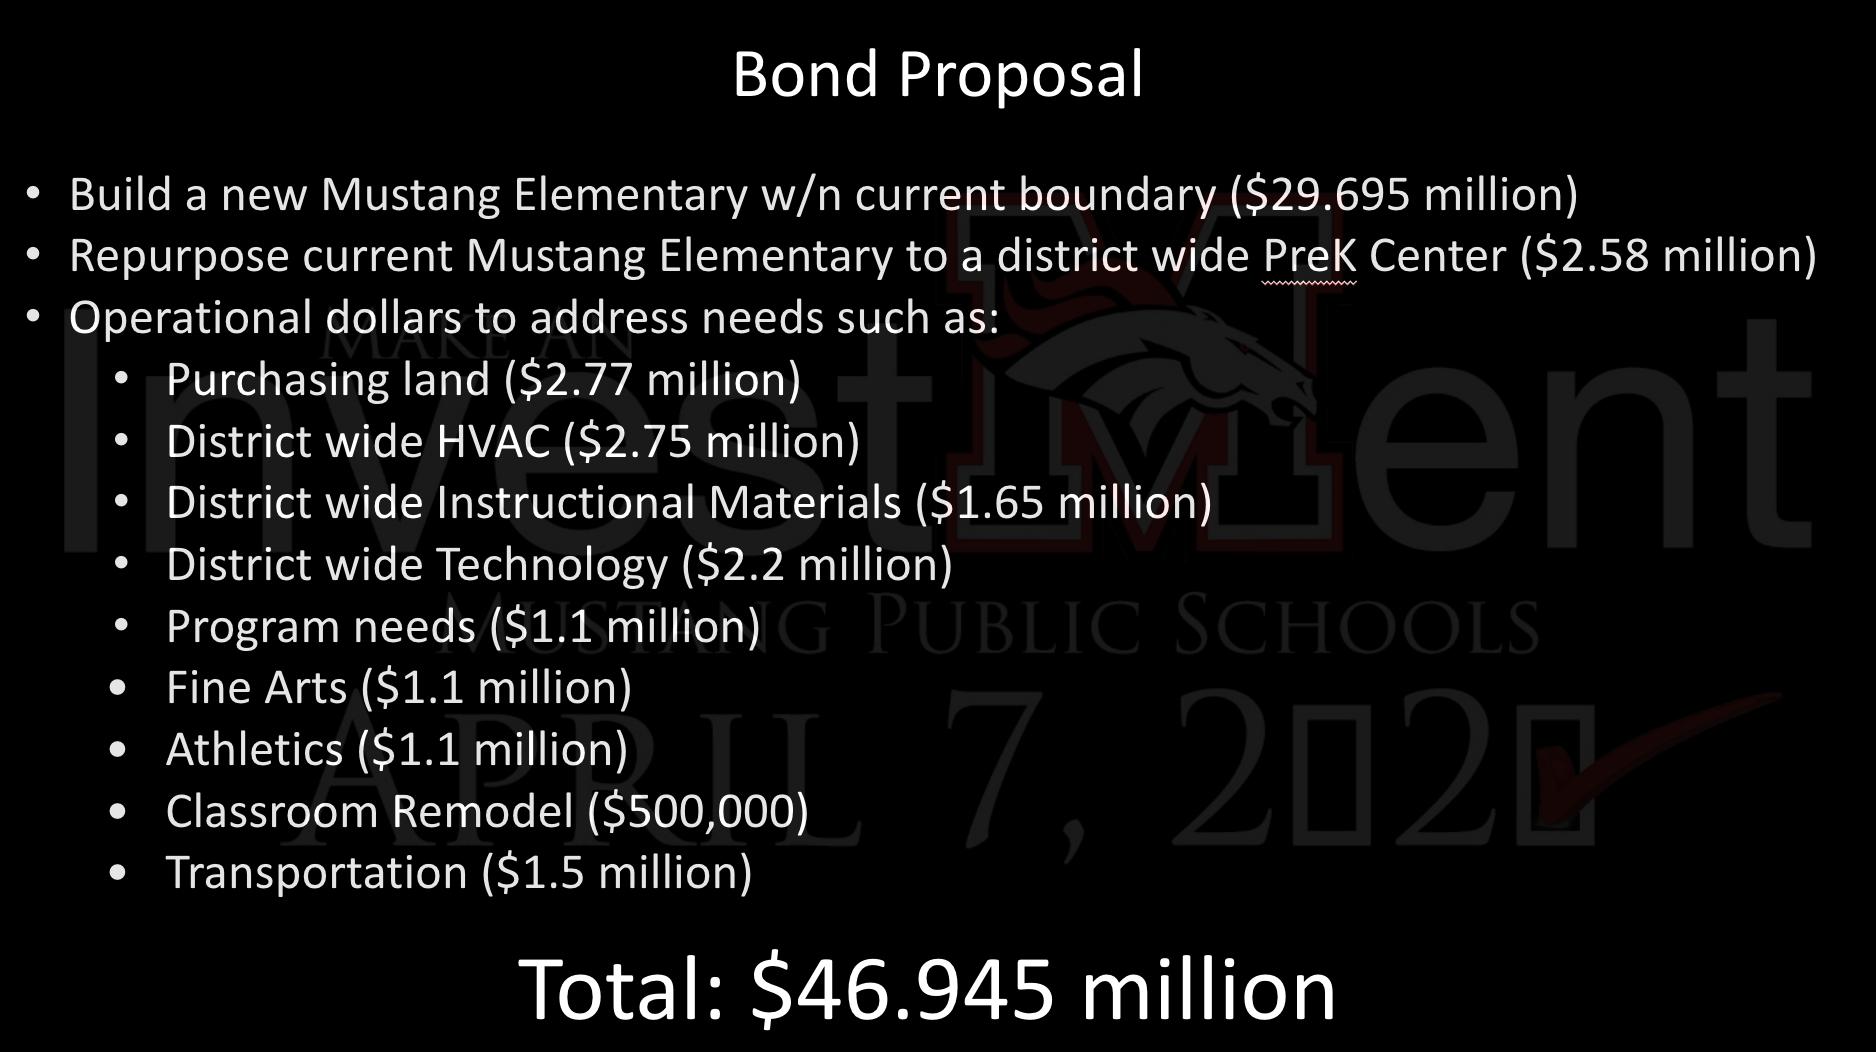 Bond Summary slide